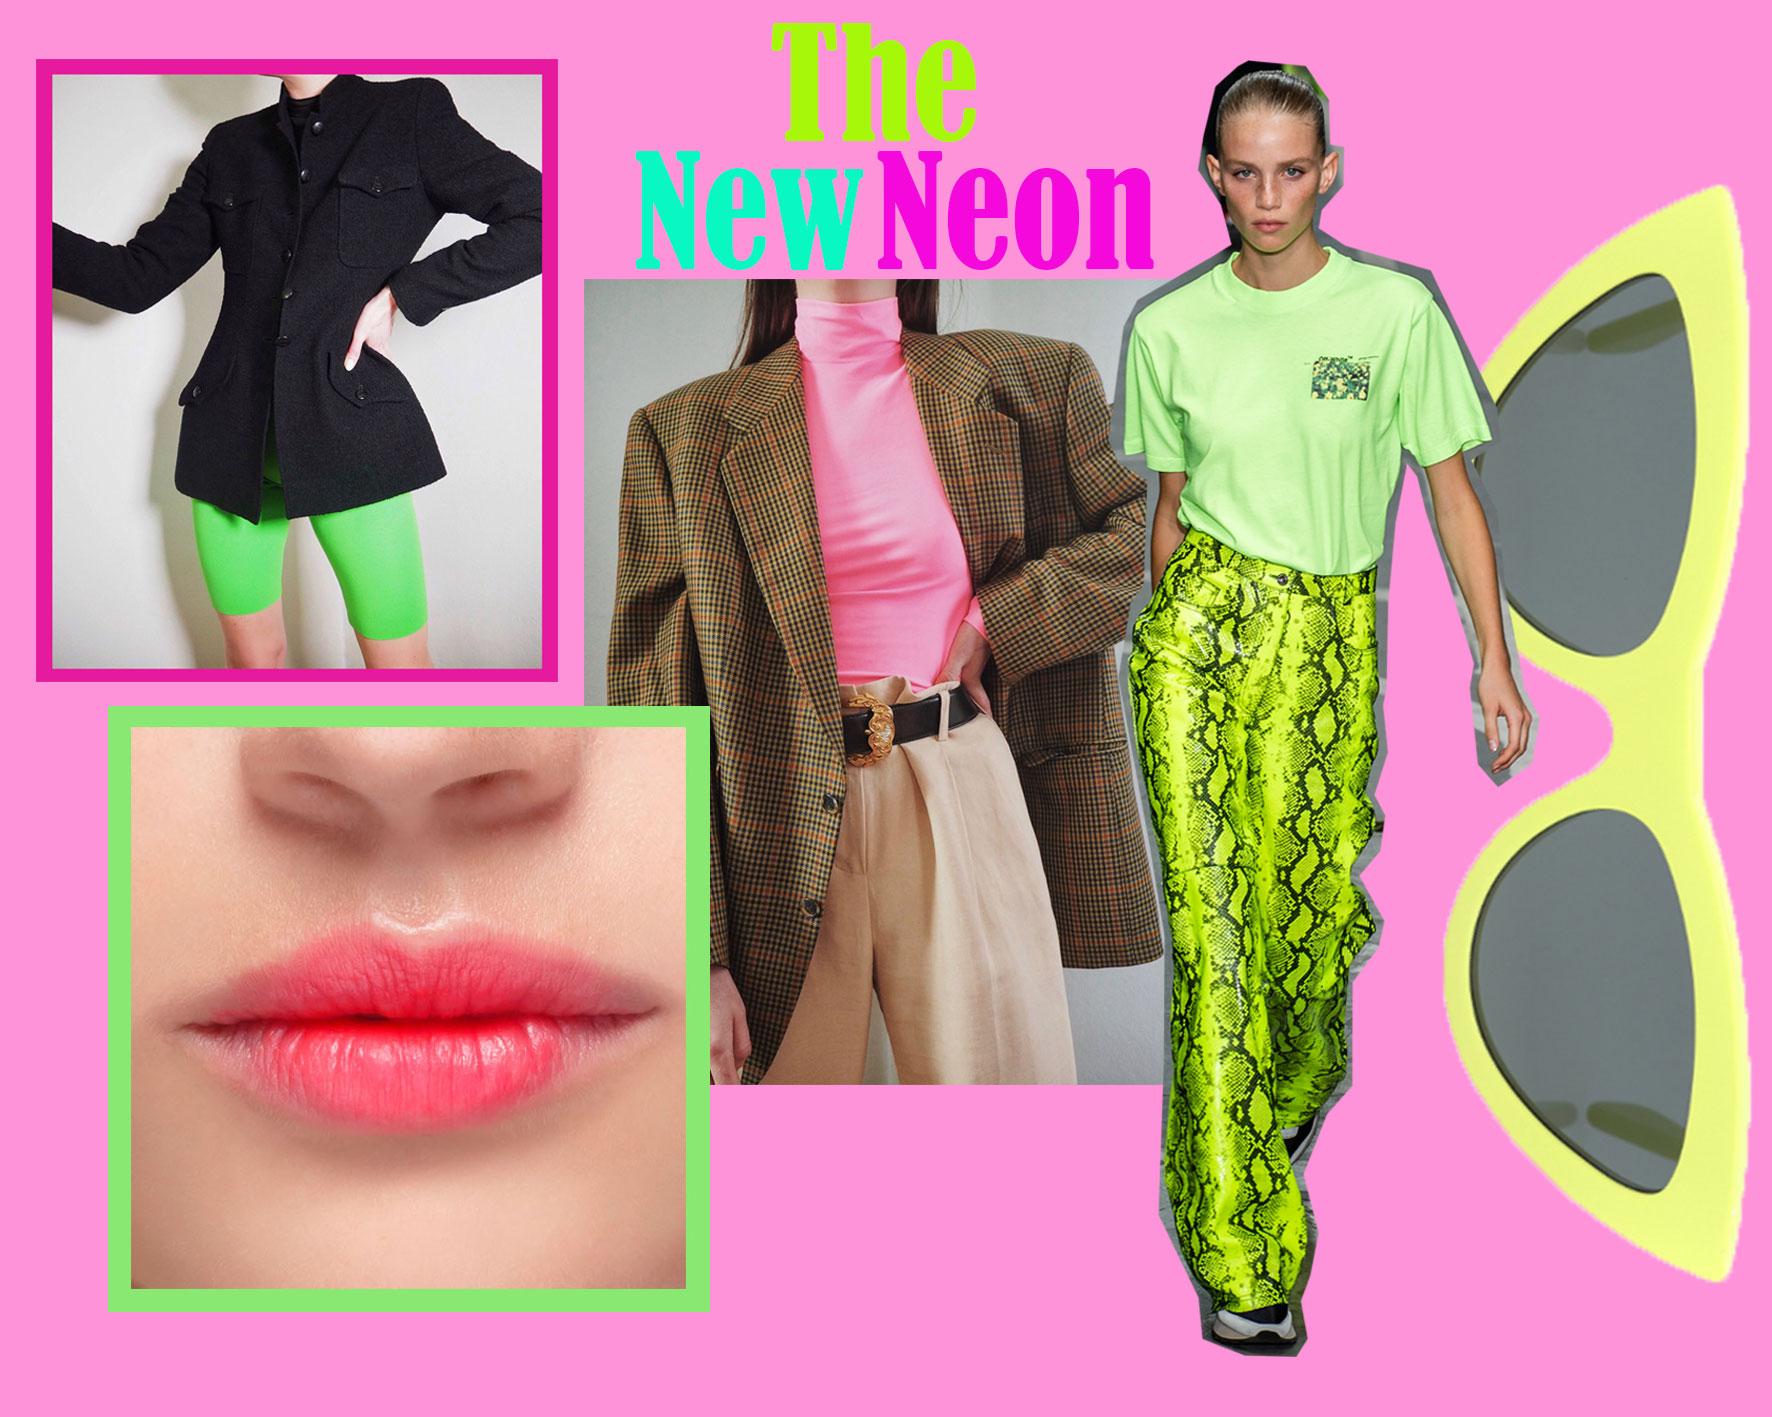 Trend: New Neon